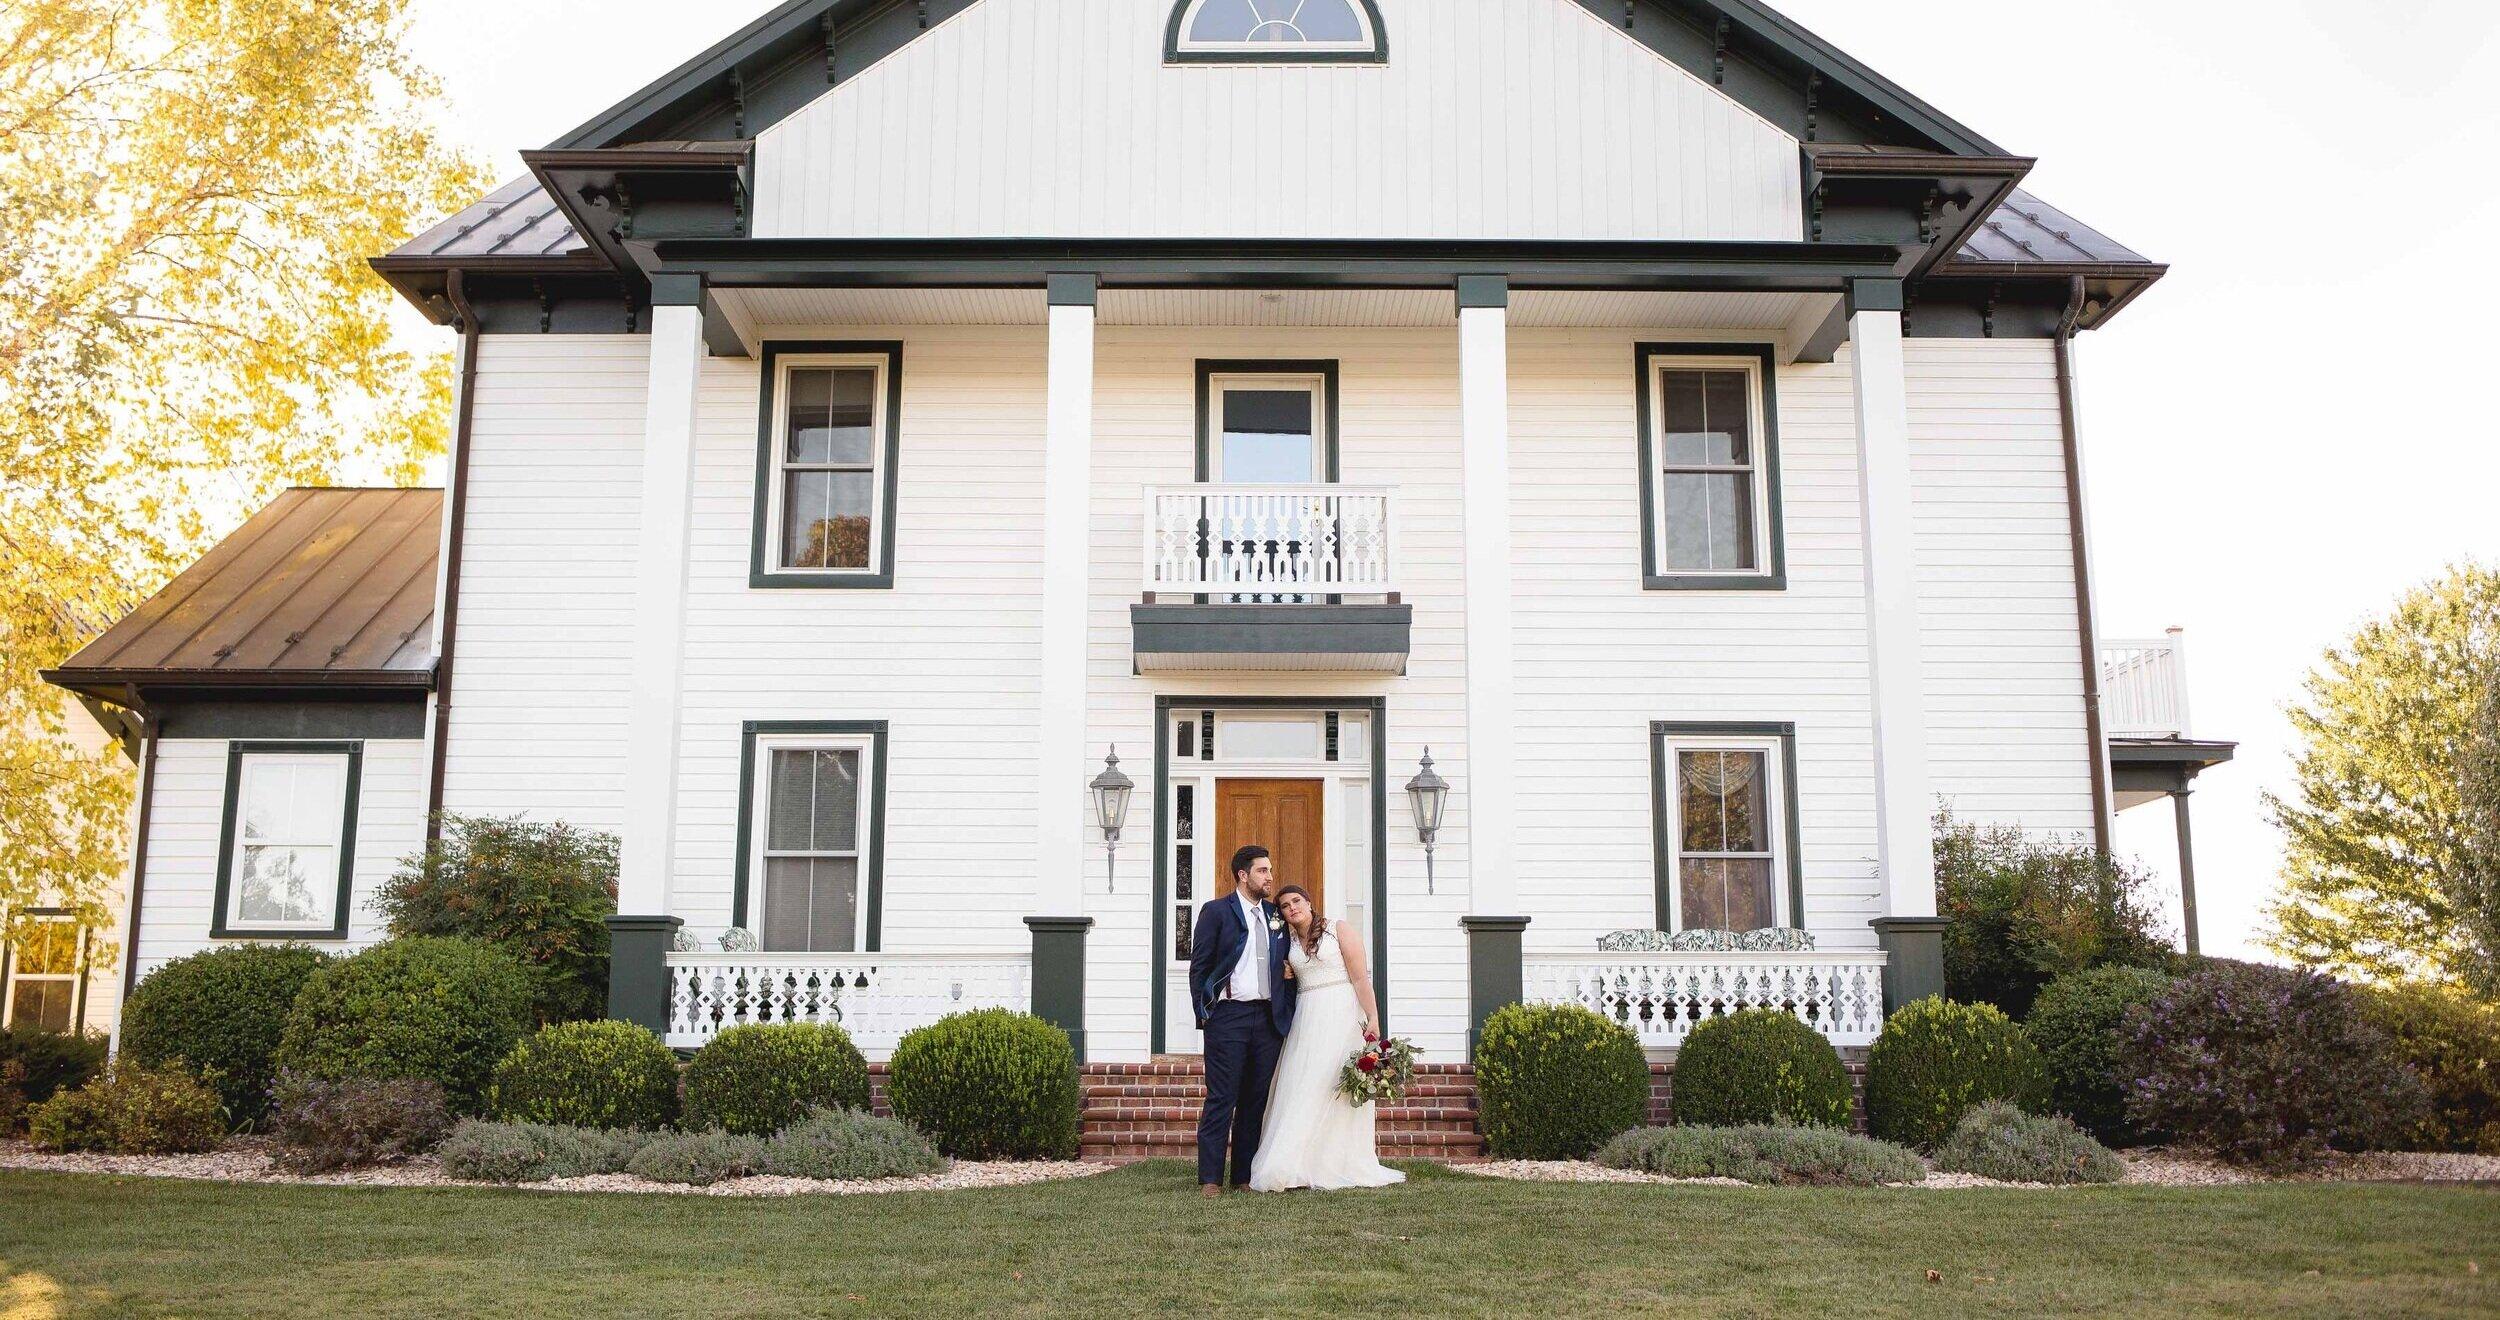 katherine-zell-lancaster-wedding-photographer-home.jpg